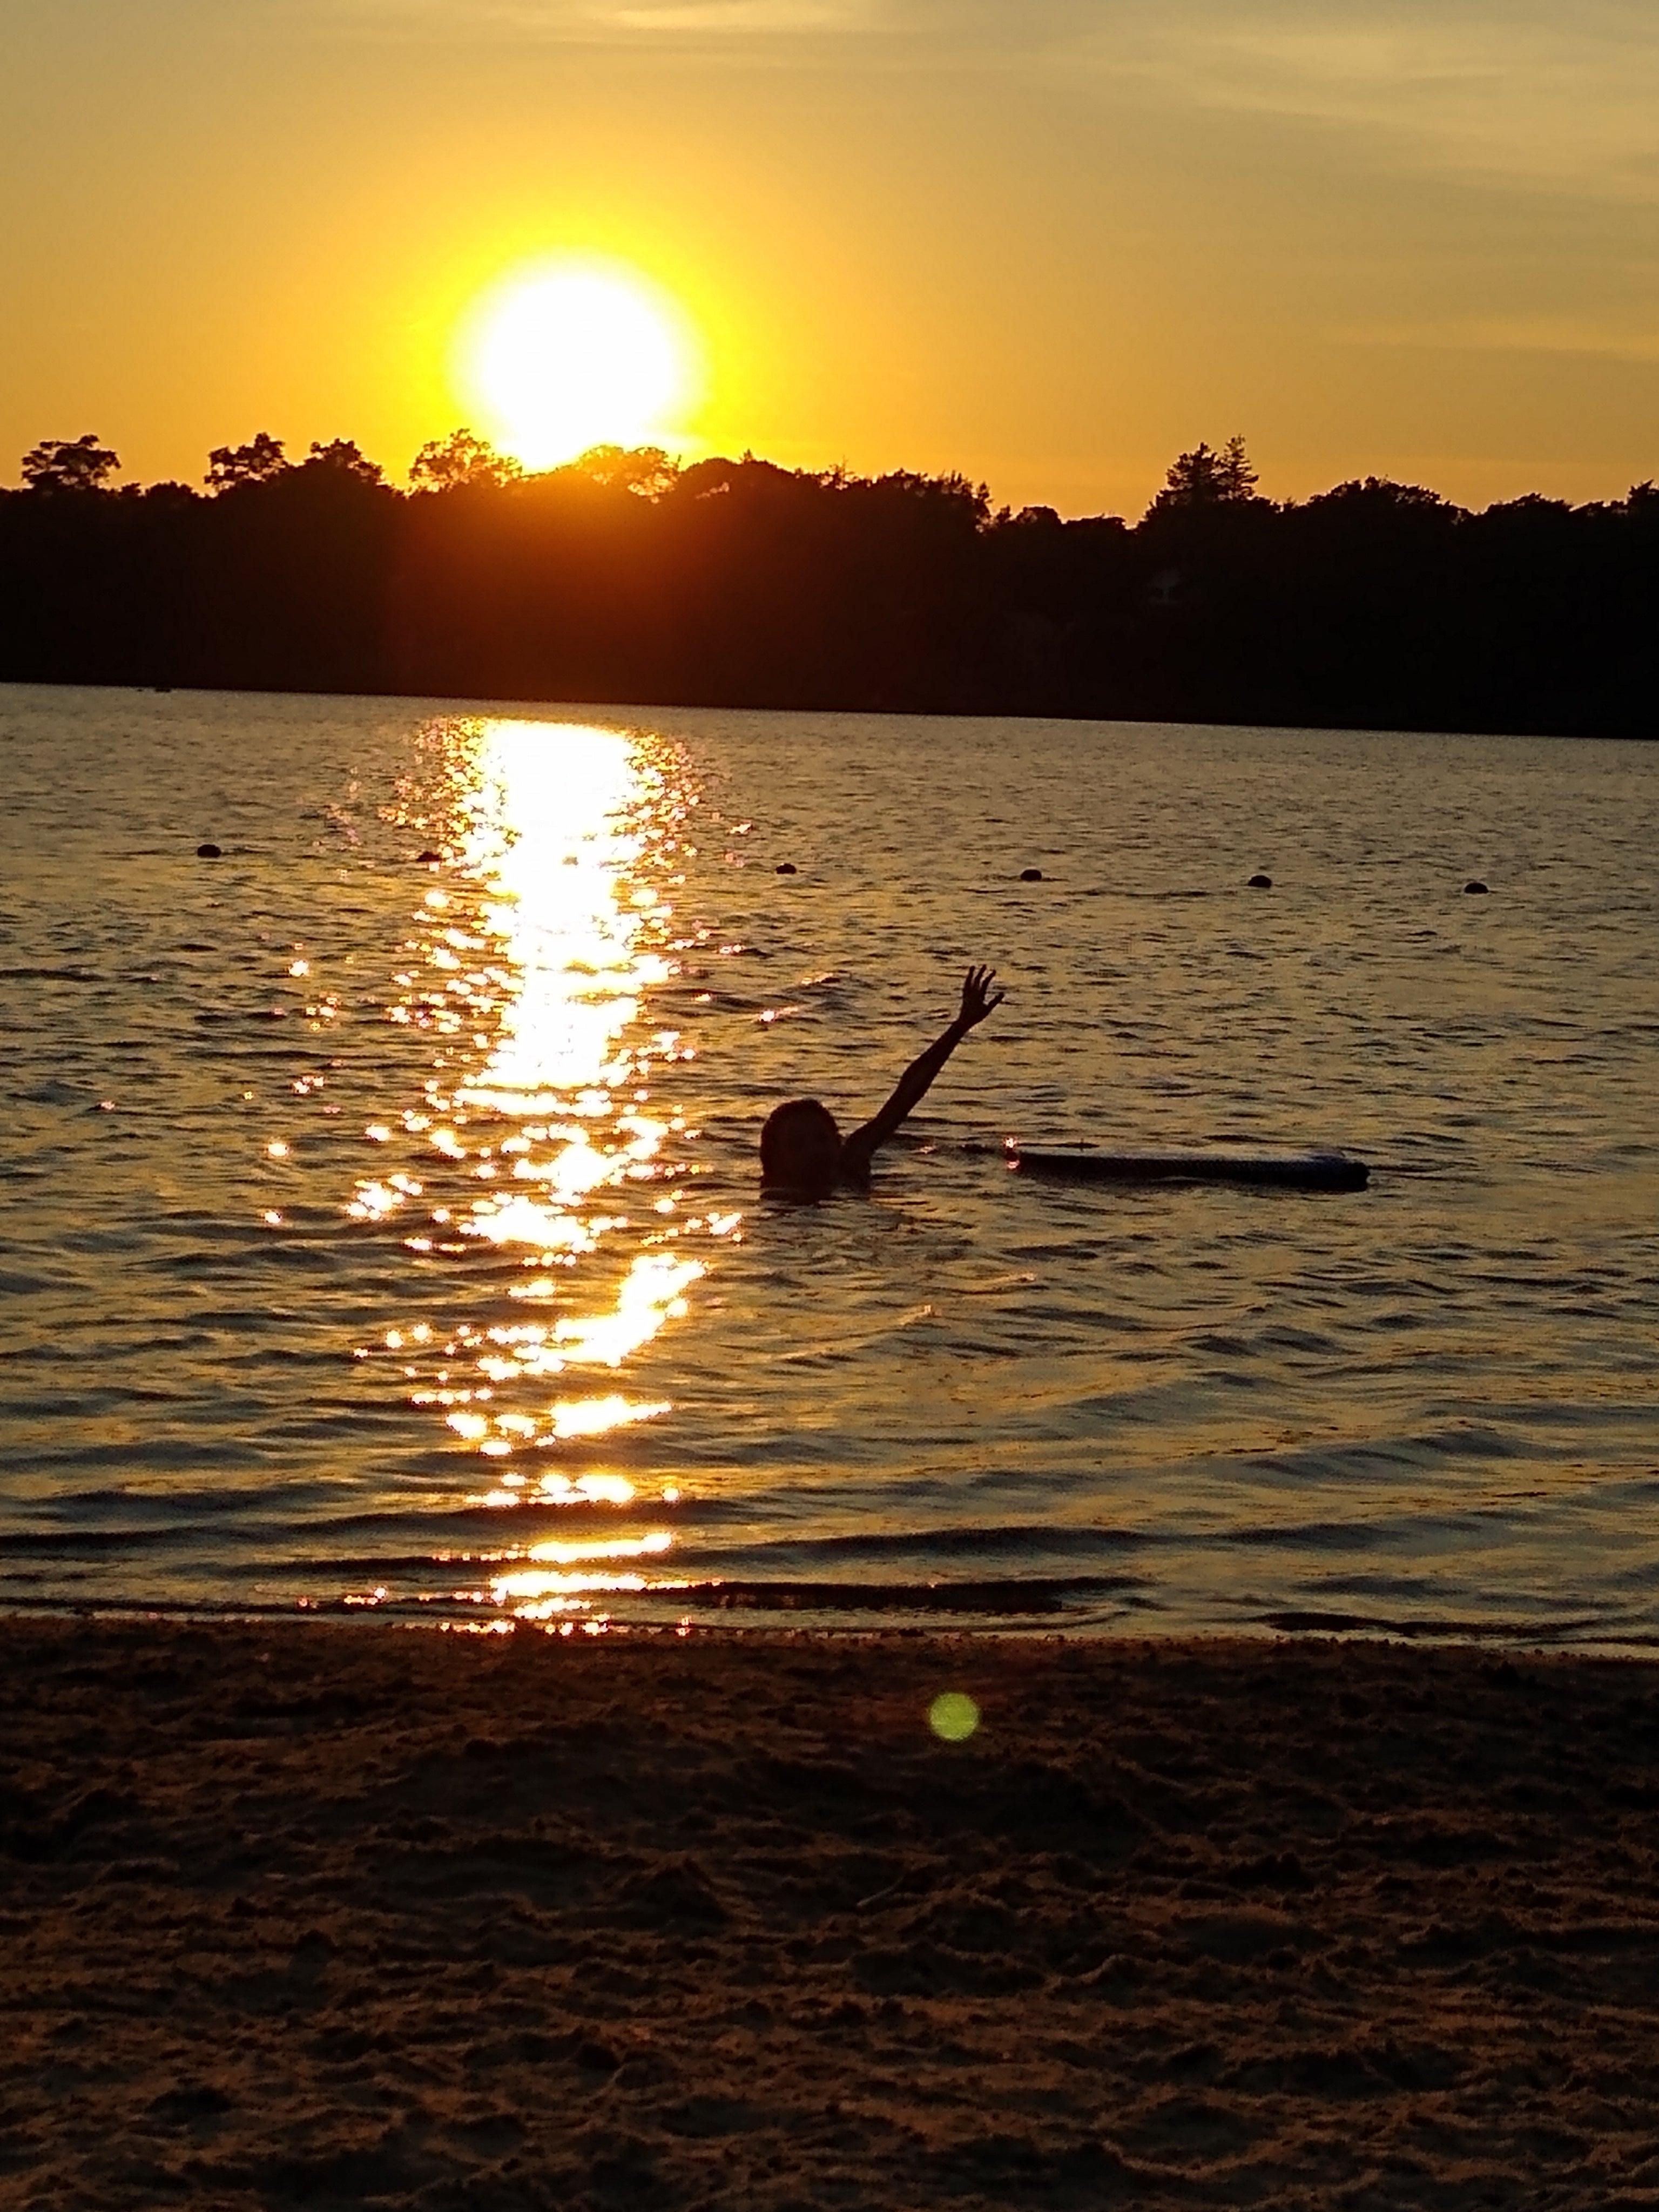 Scargo Lake in South Dennis